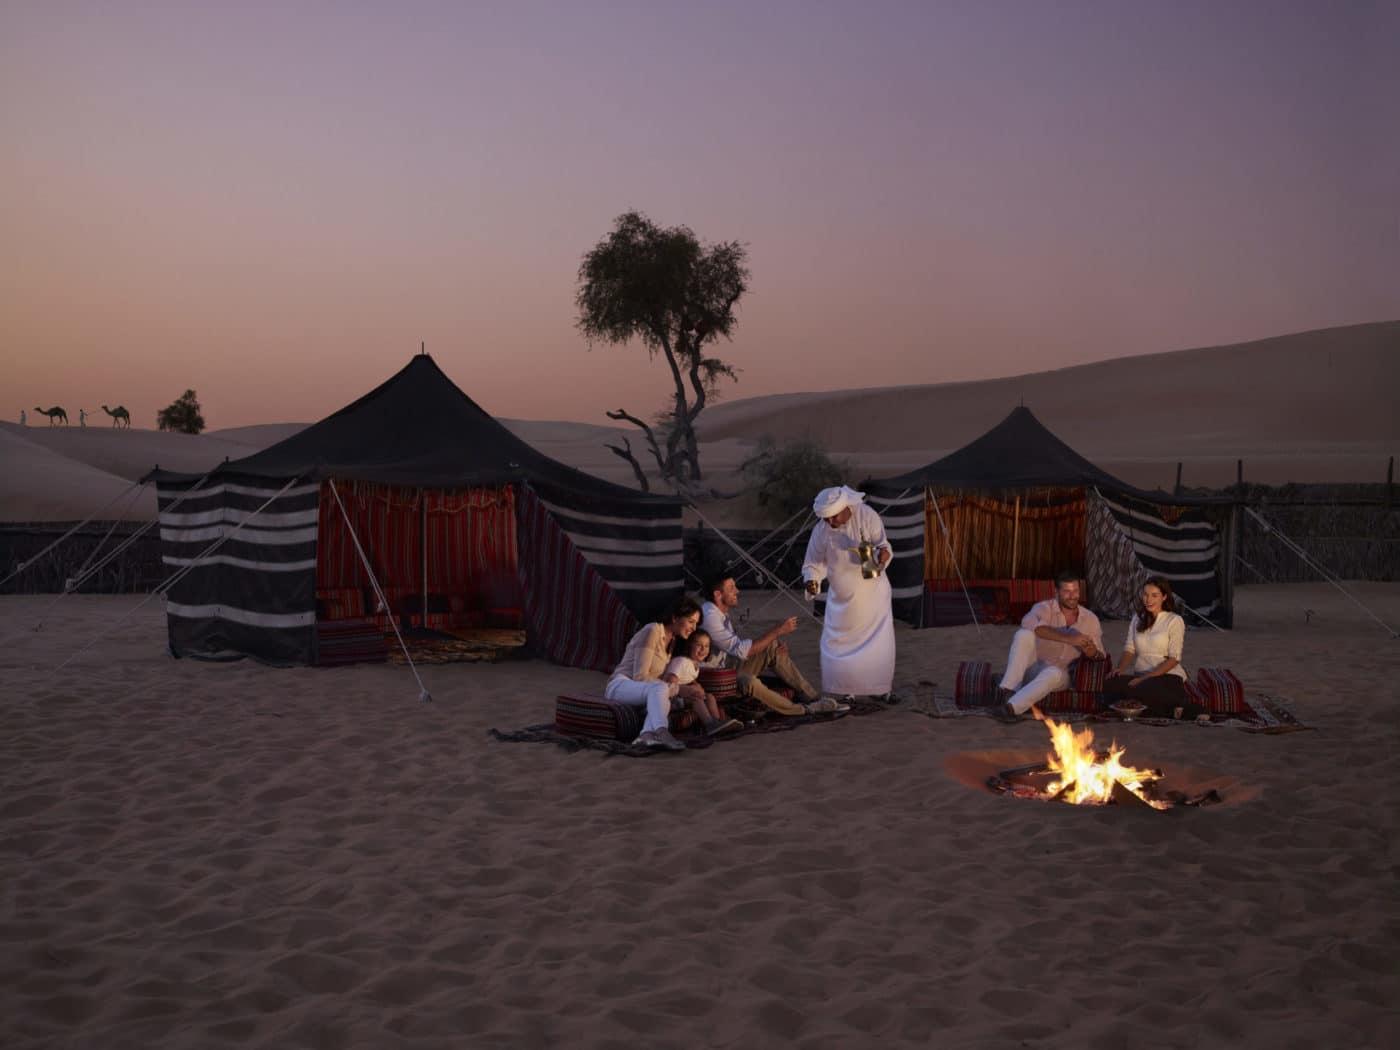 Abu Dhabi Travel in Style